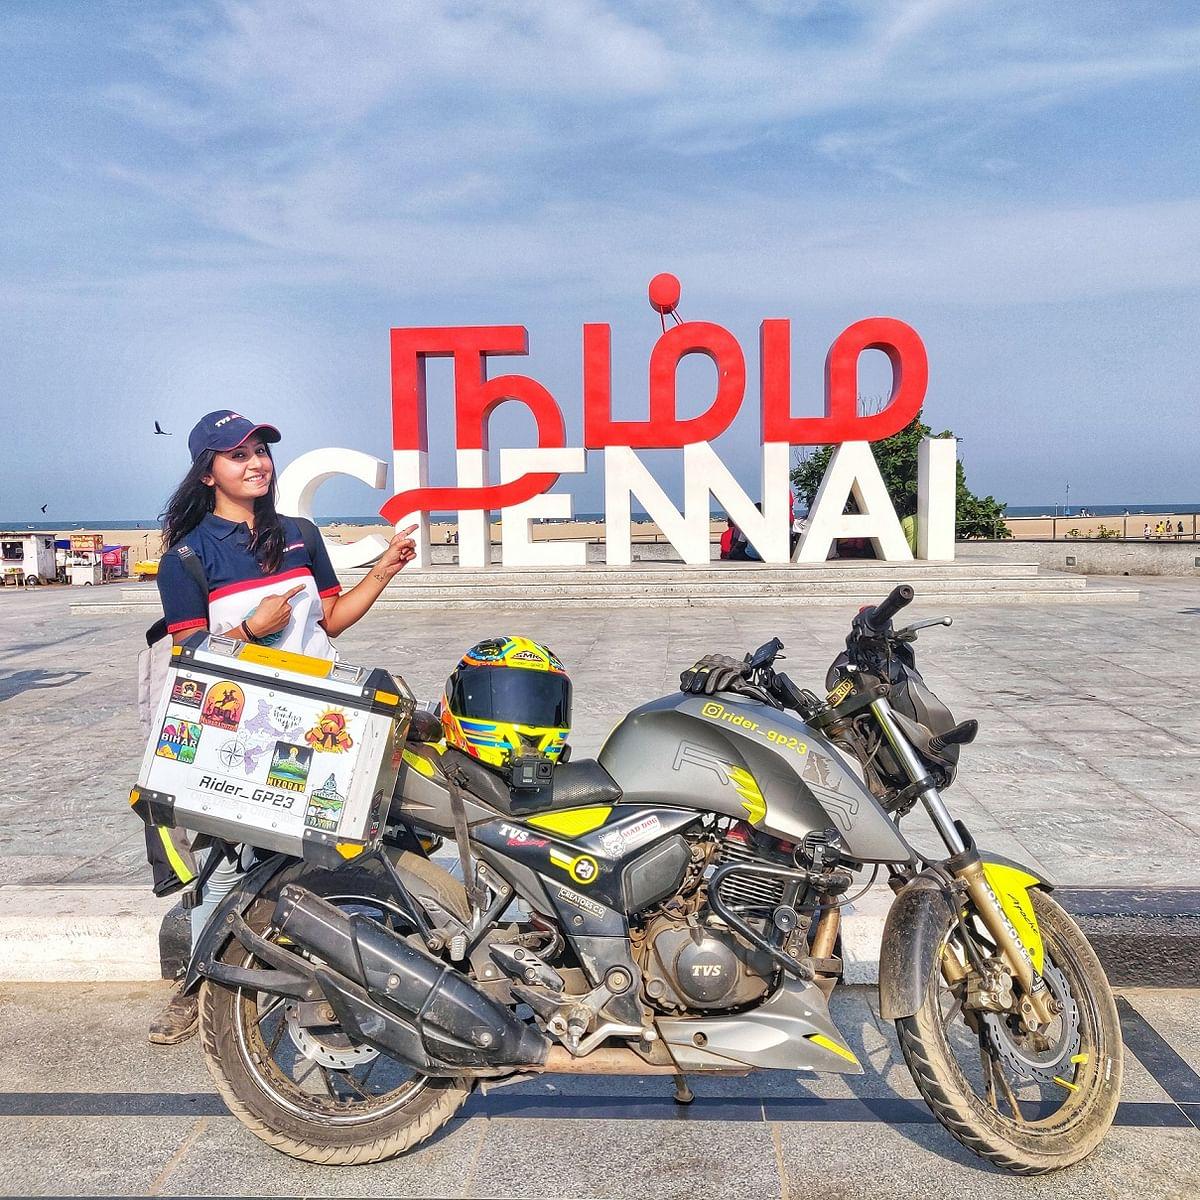 TVS Apache rider Gayatri Patel part of One Dream, One Ride: Indian Odyssey ride reaches Chennai